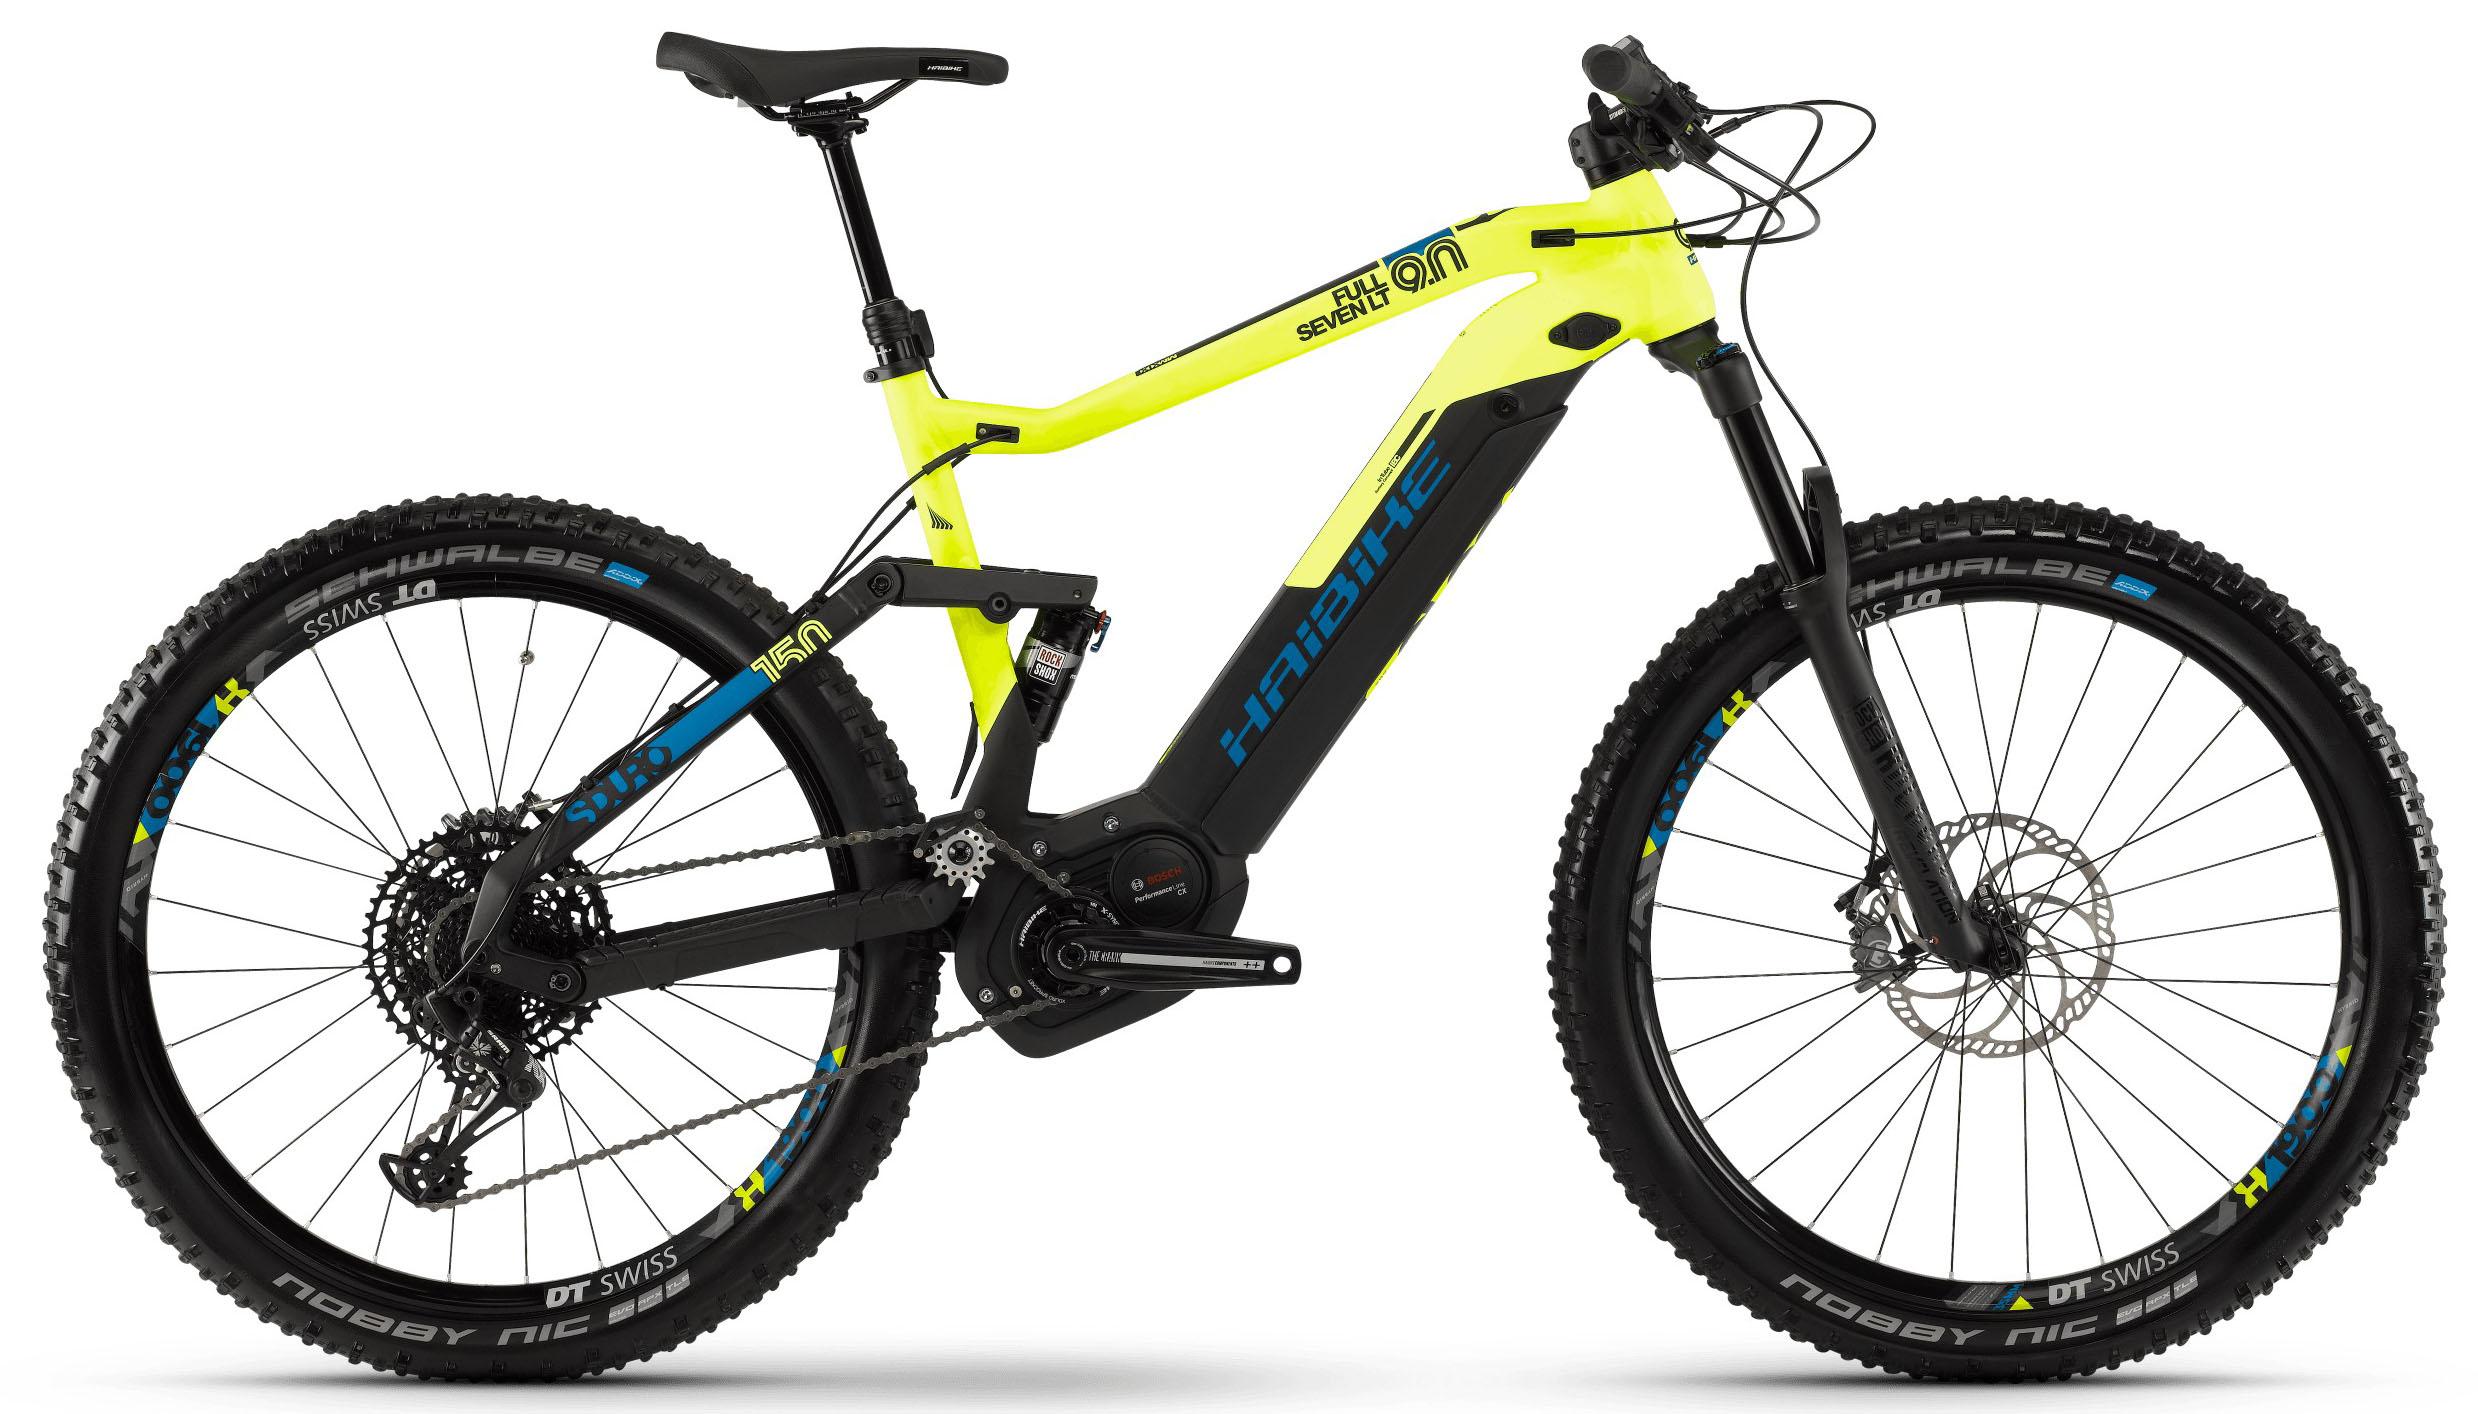 Велосипед Haibike SDURO FullSeven LT 9.0 i500Wh 12-G NX 2019 велосипед haibike xduro fullseven carbon 9 0 2018